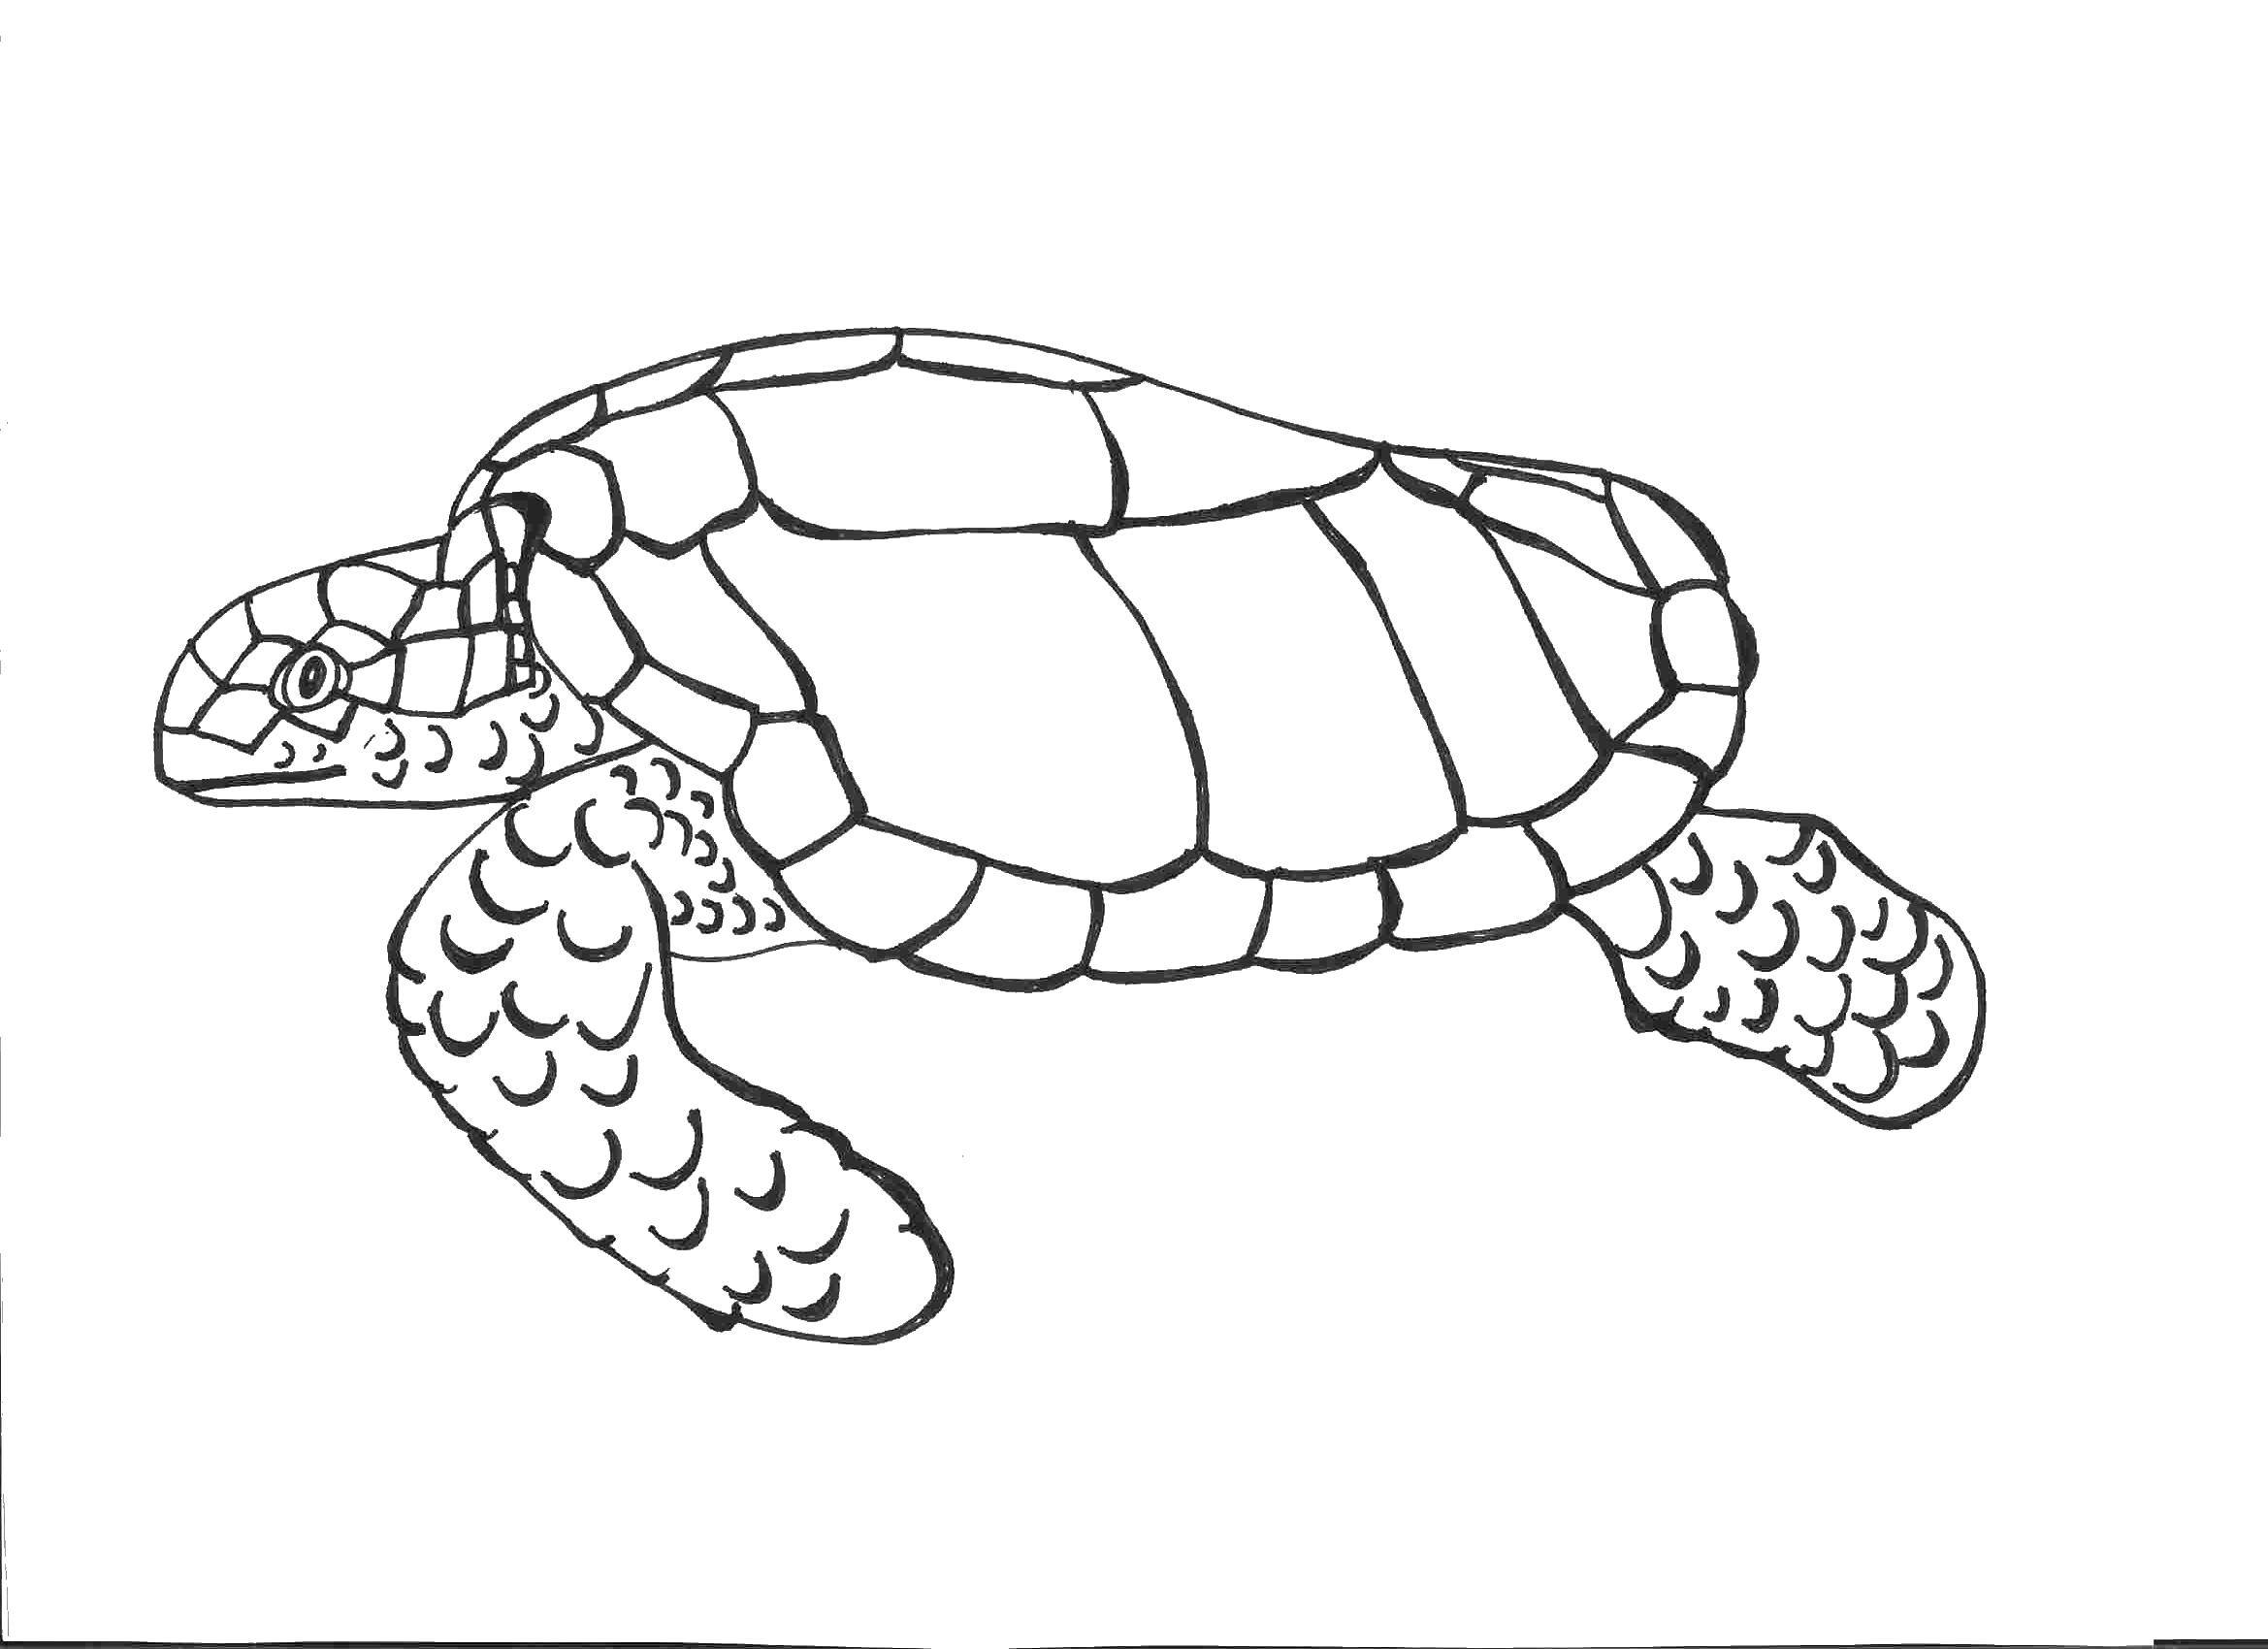 Раскраски морская черепаха раскраска